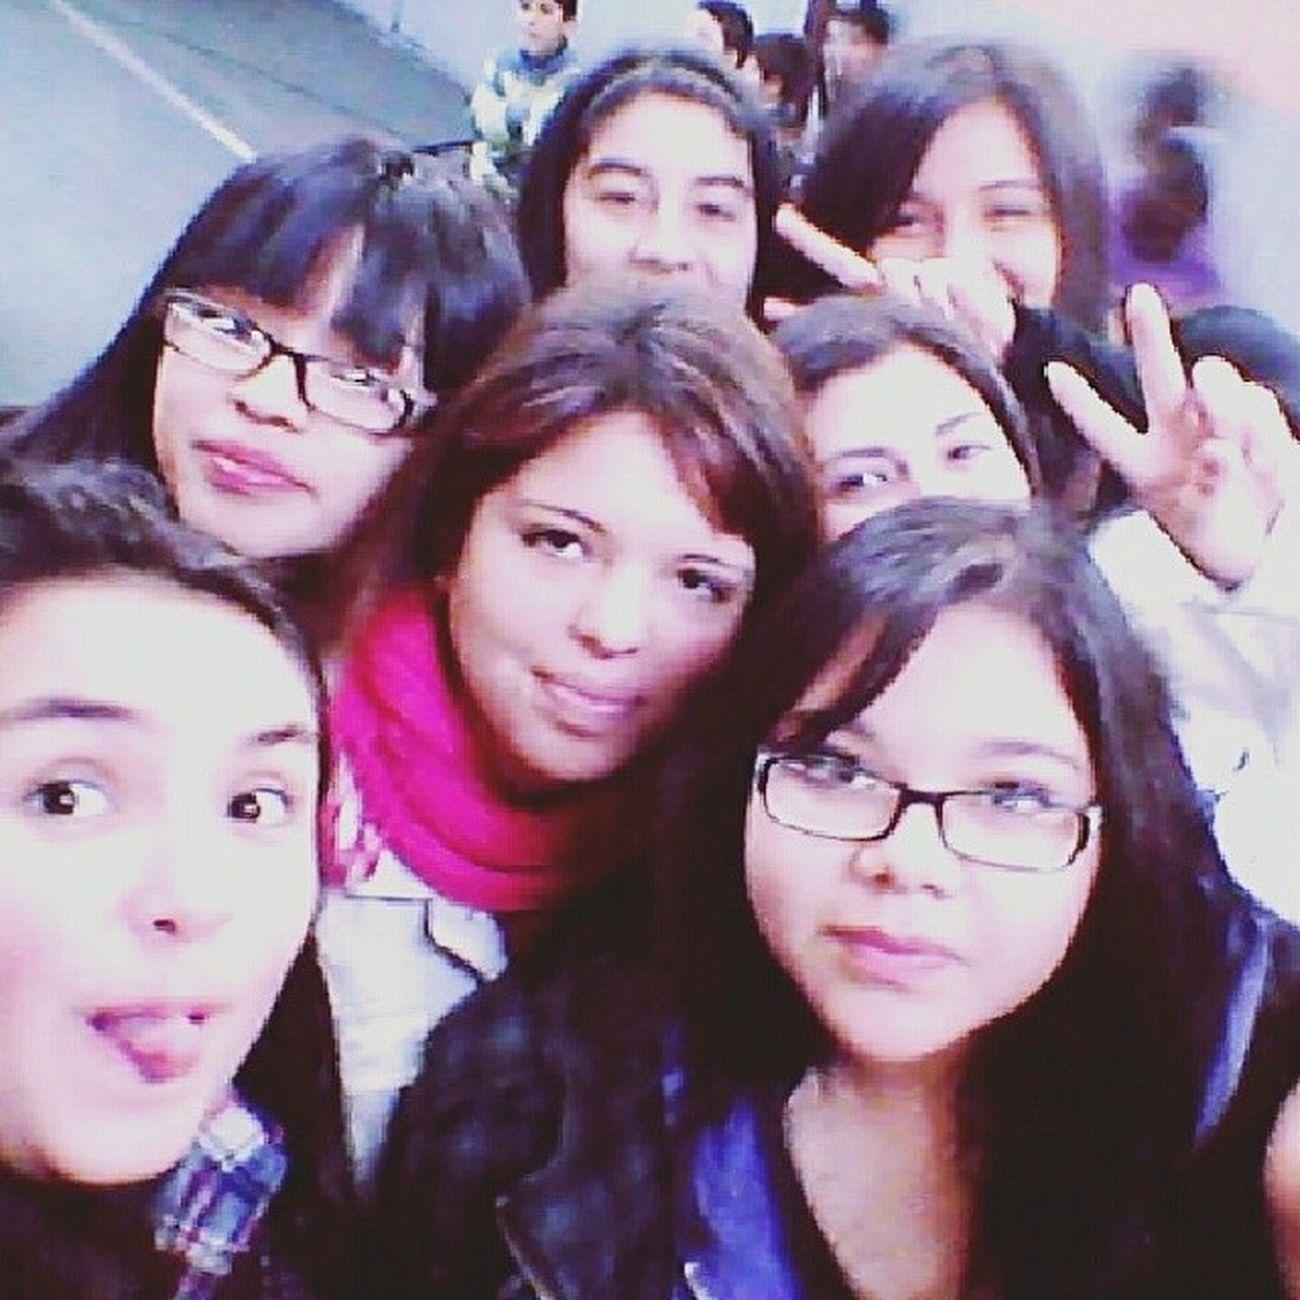 Selfie Diadelalumno Instachile Chileangirl Caras Hermosas jaja